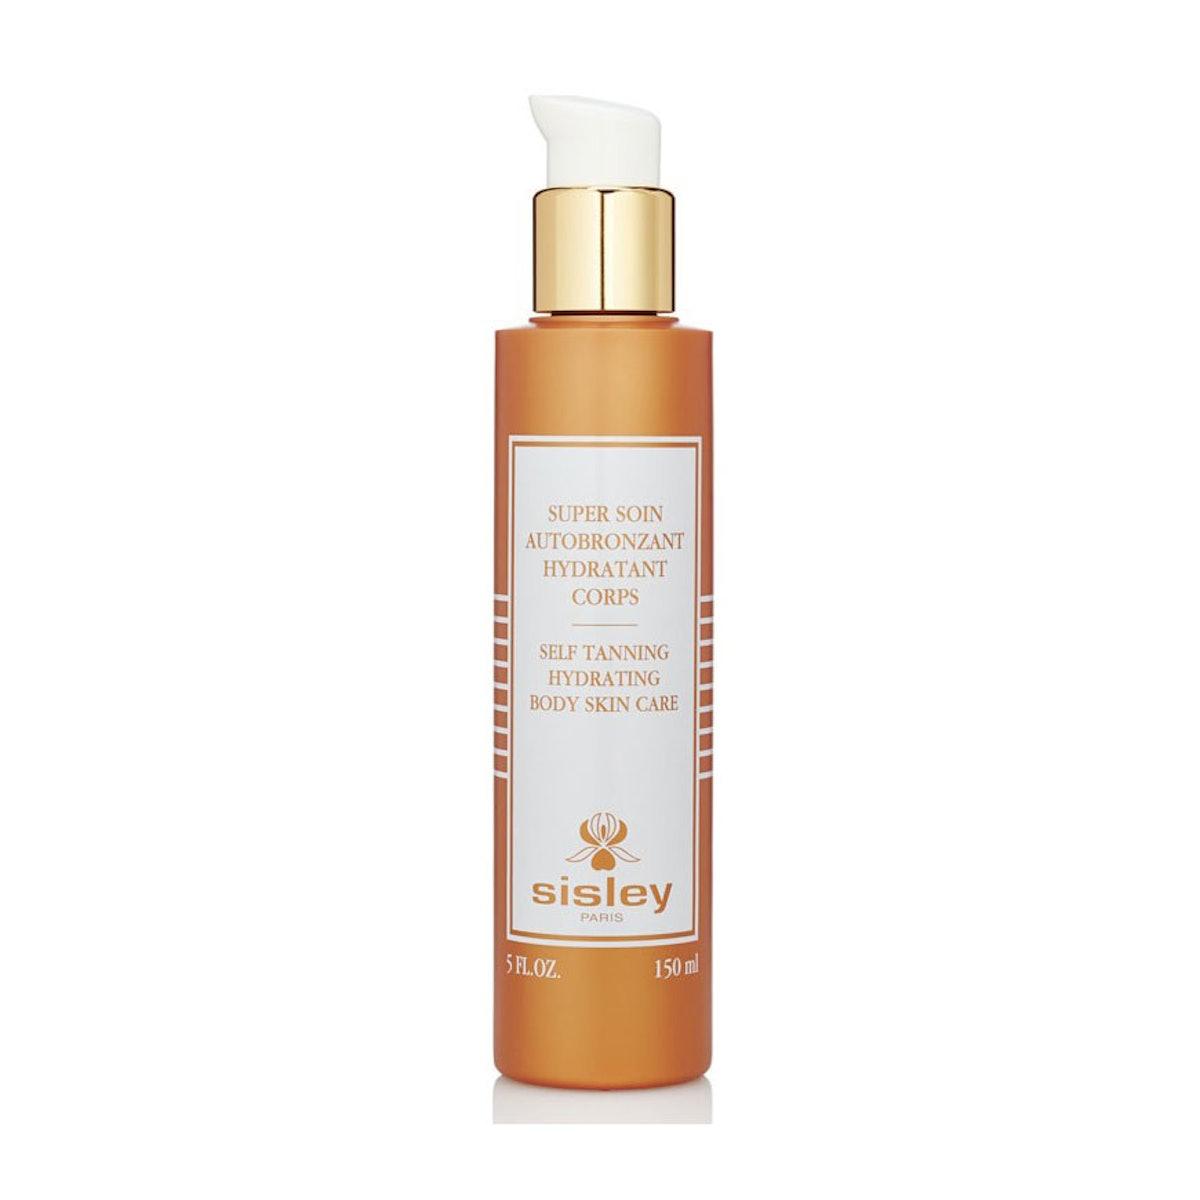 Sisley Self-Tanning Hydrating Body Skin Care